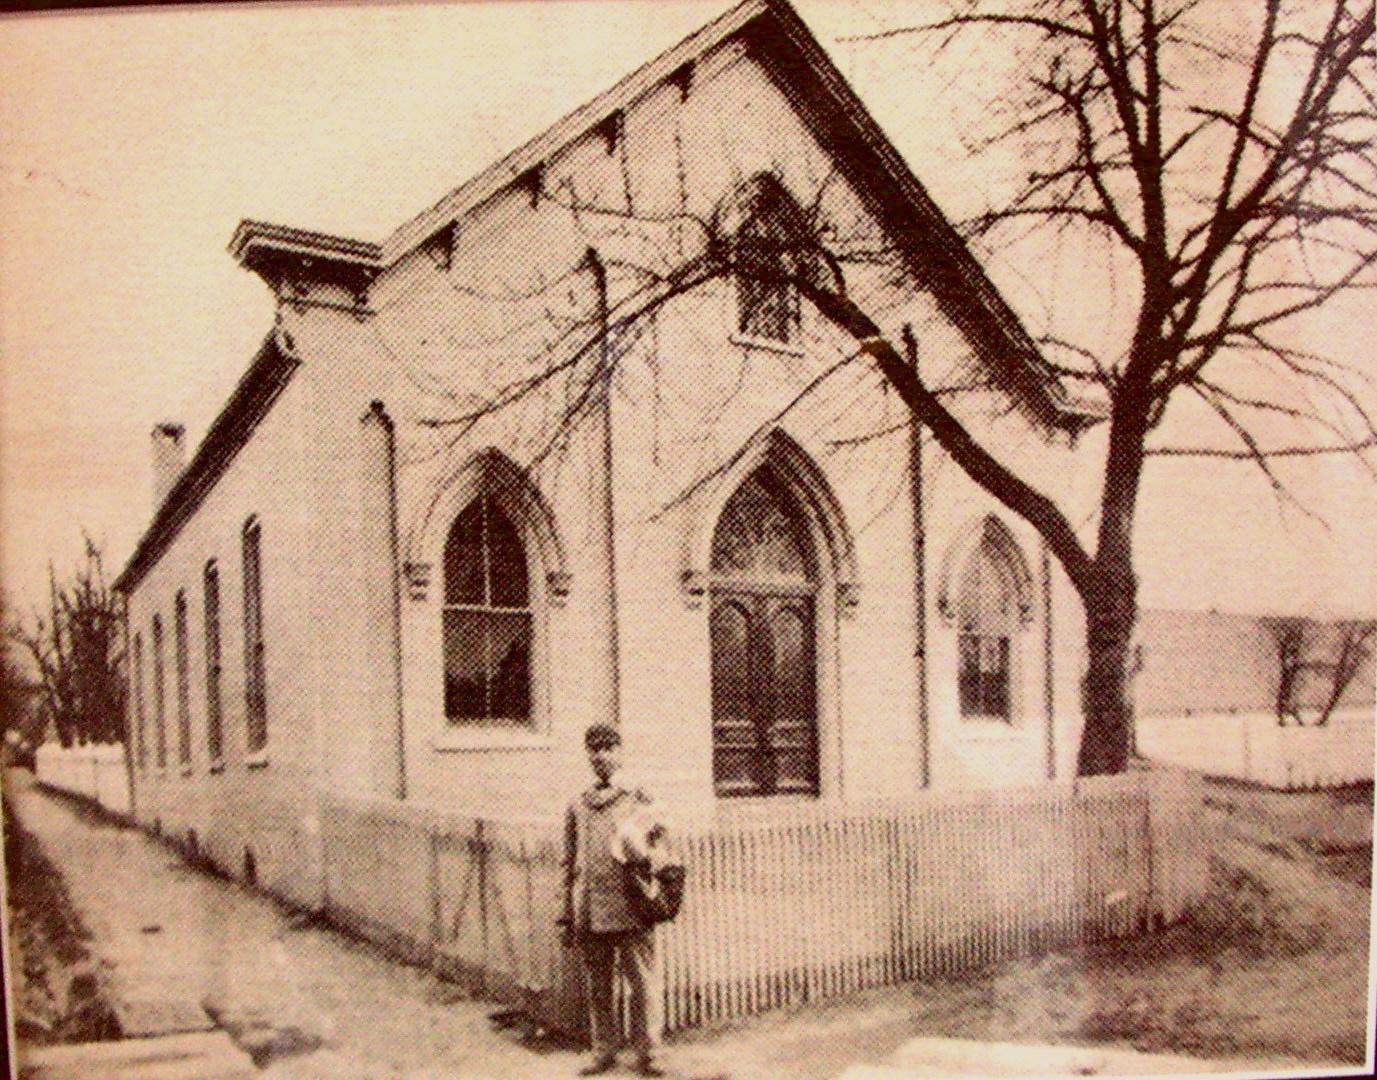 7-*BETHEL AFRICAN METHODIST CHURCH (1817) LANCASTER, PENNSYLVANIA (c. BETHEL AFRICAN METHODIST CHURCH)